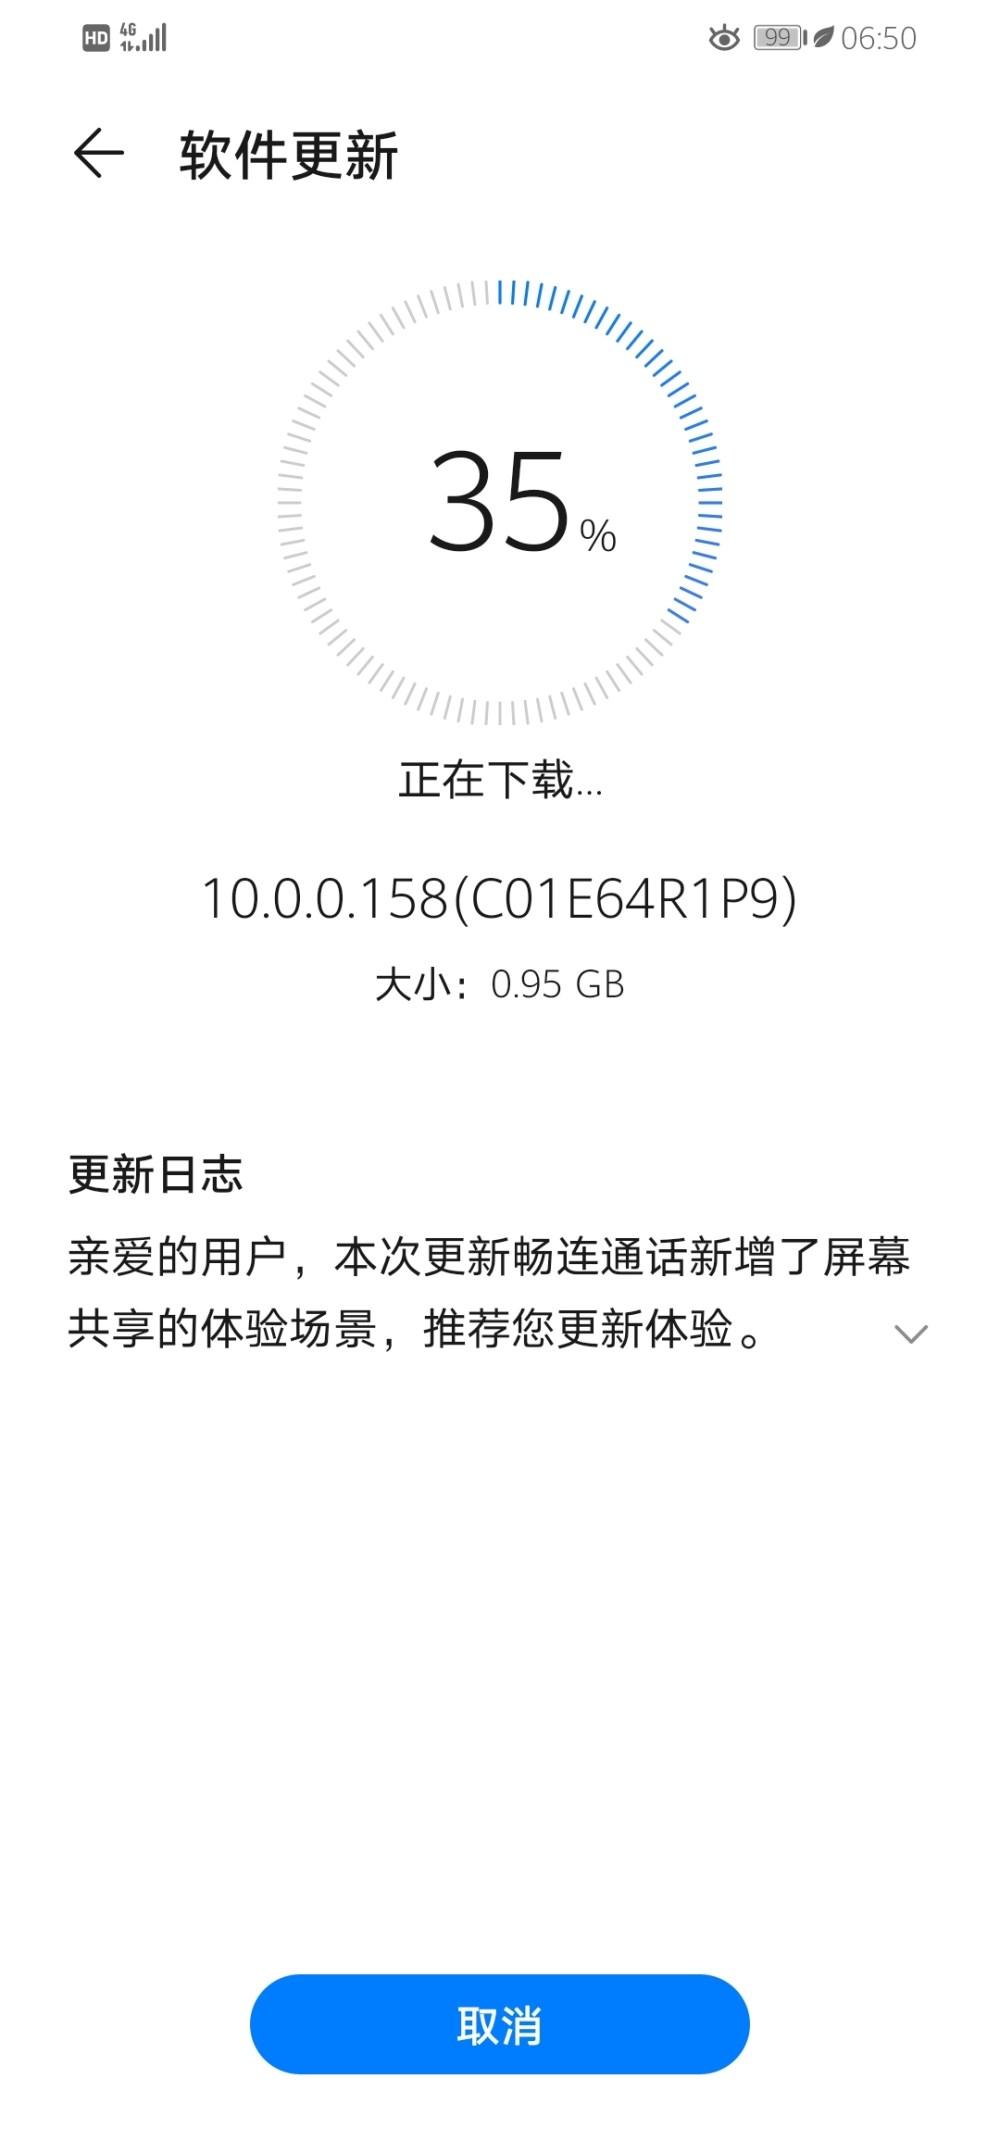 Huawei Nova 4e EMUI 10.0.0.158